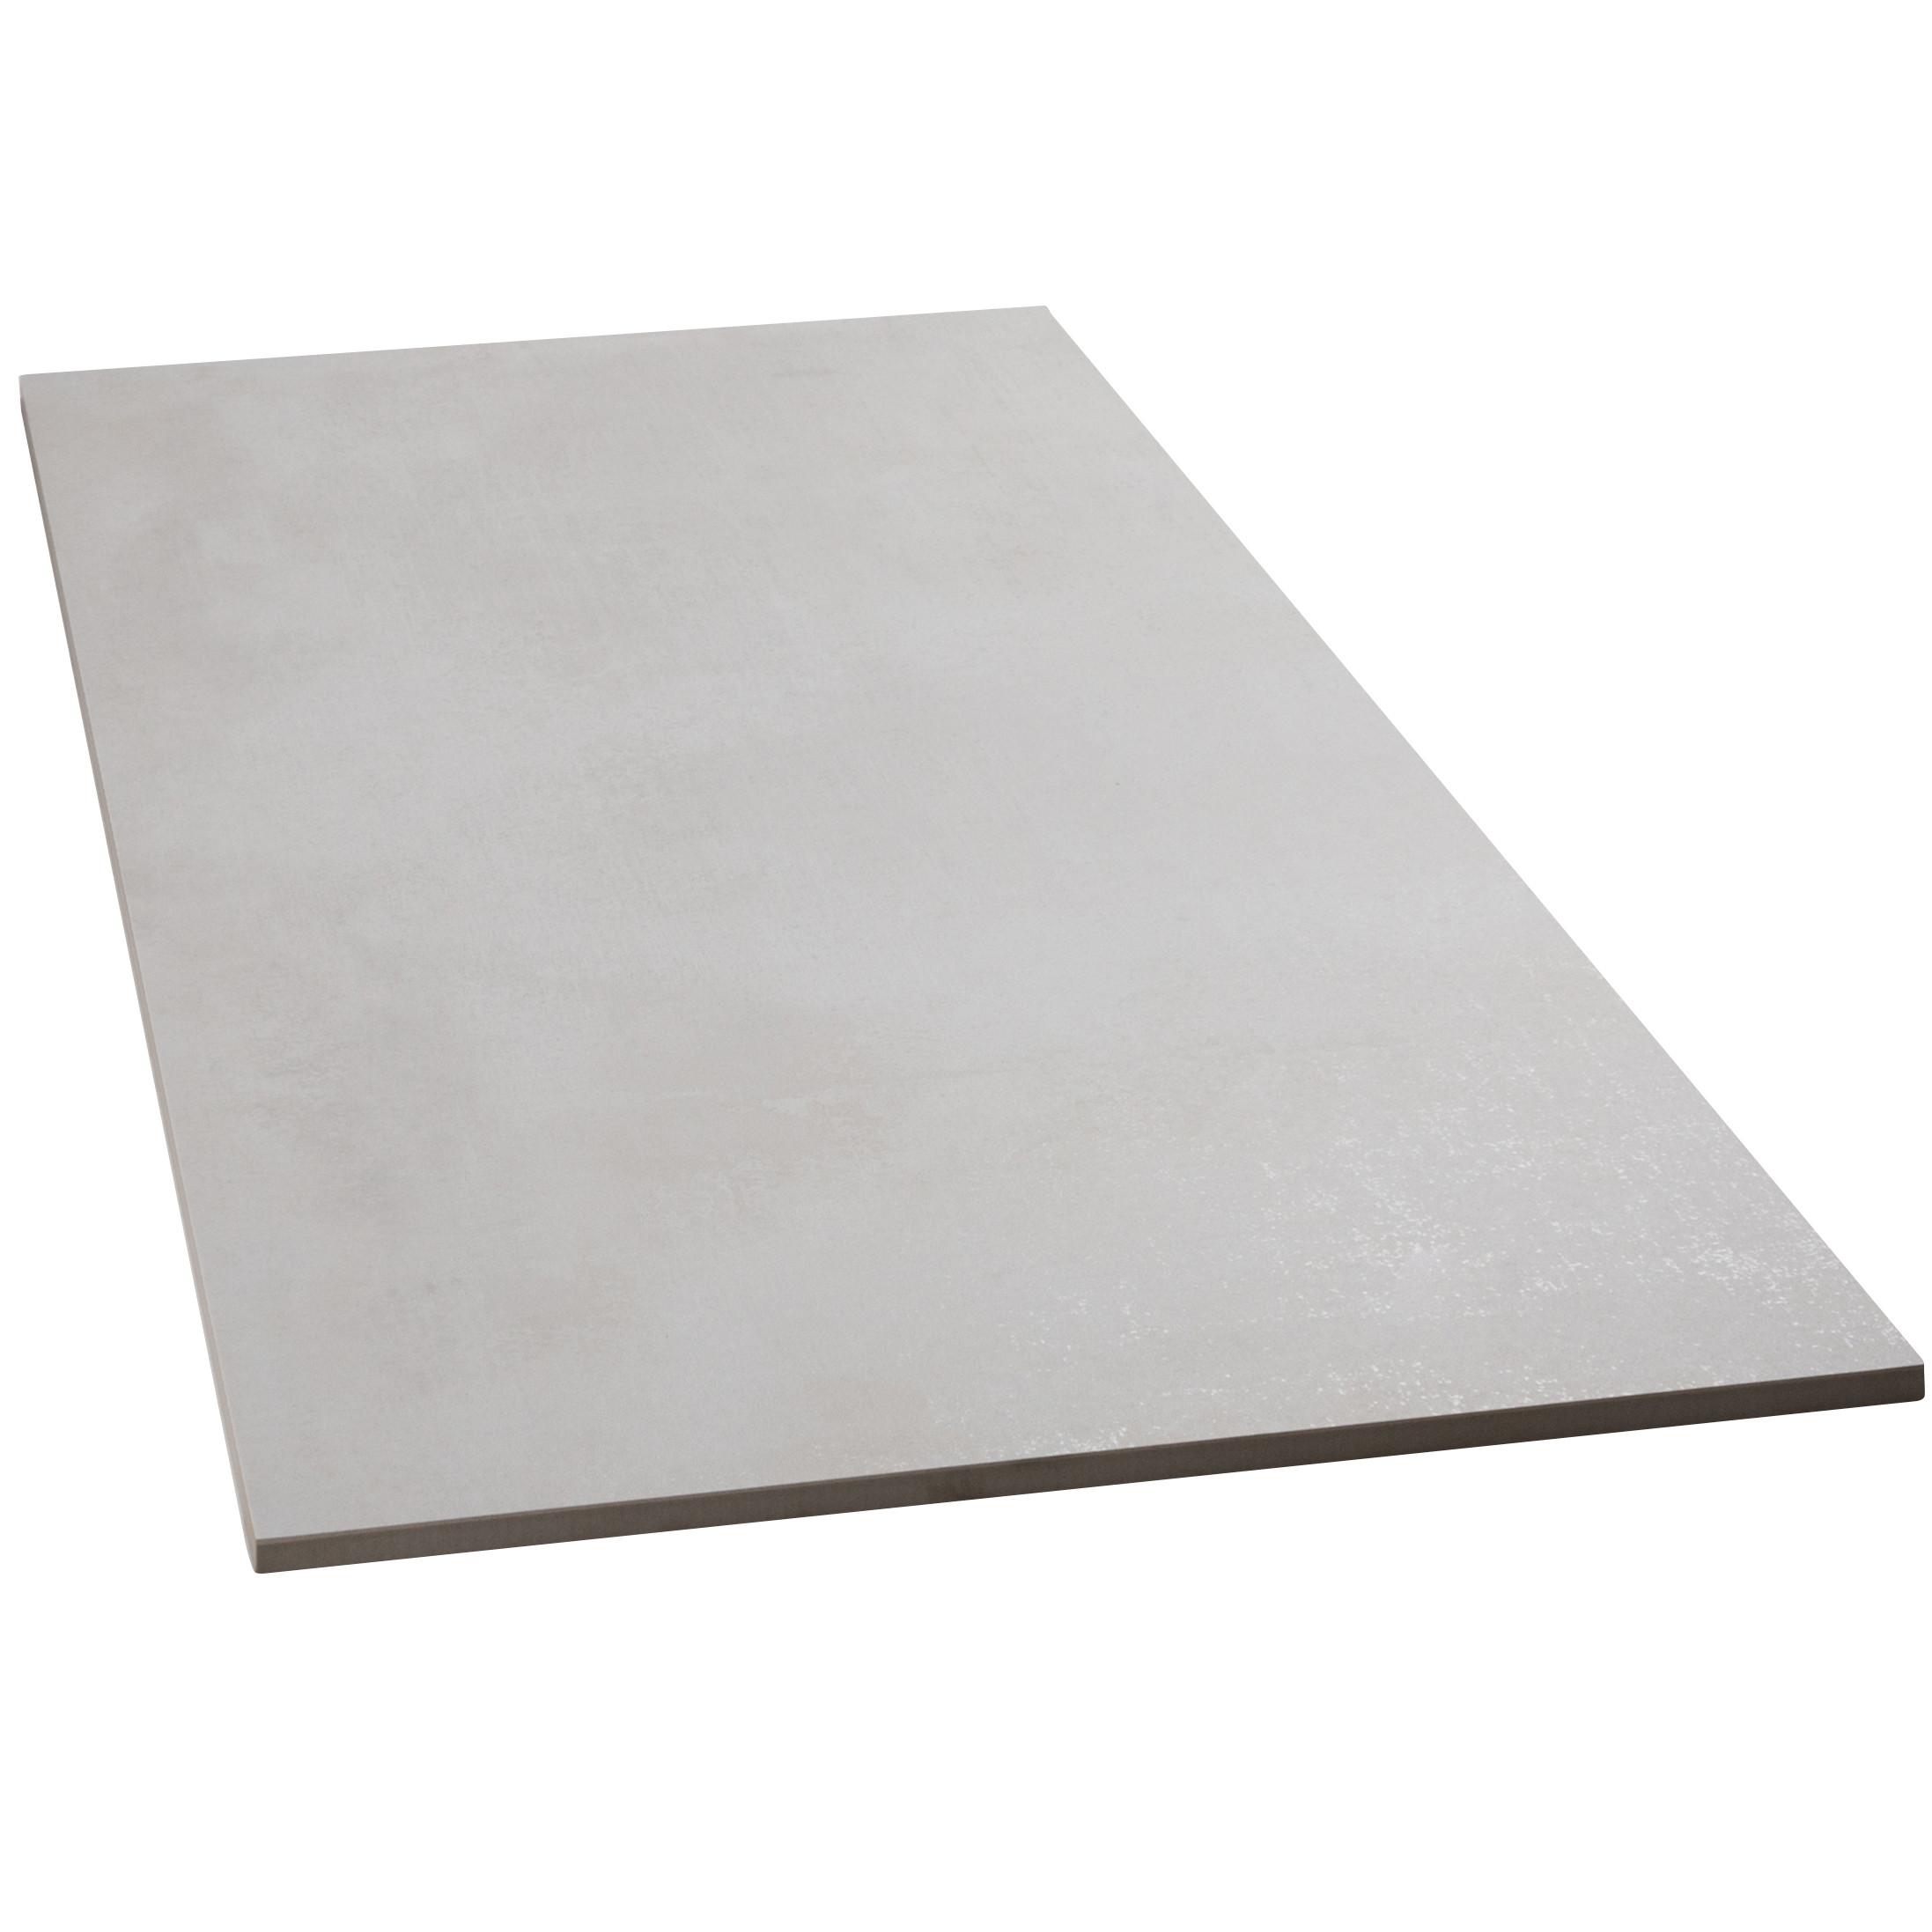 Bodenfliesen Sonderposten Beton blanco matt 75x150 cm Betonoptik